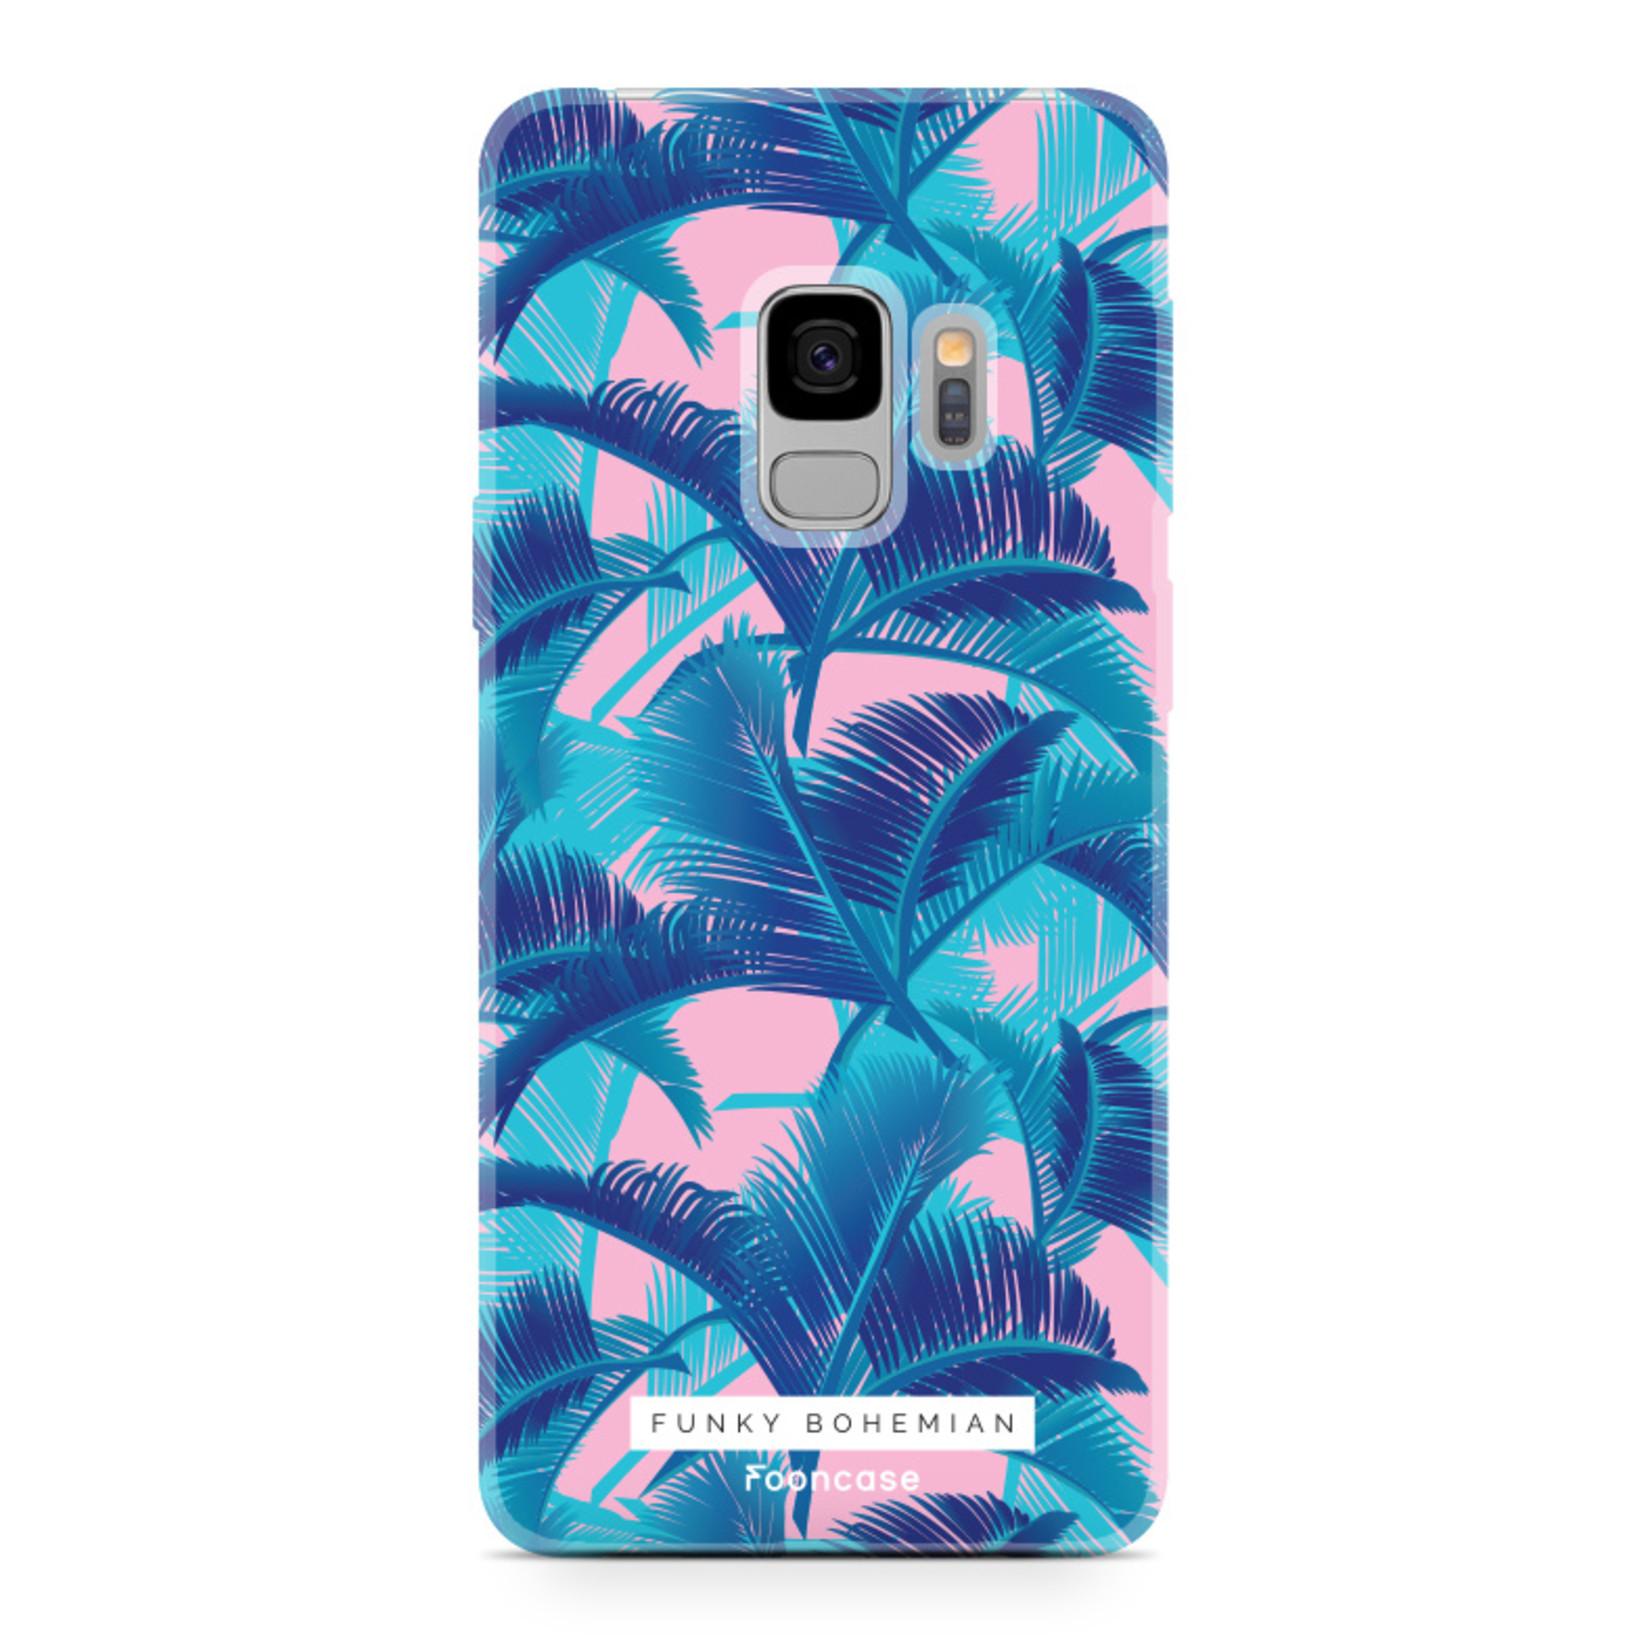 FOONCASE Samsung Galaxy S9 Handyhülle - Funky Bohemian